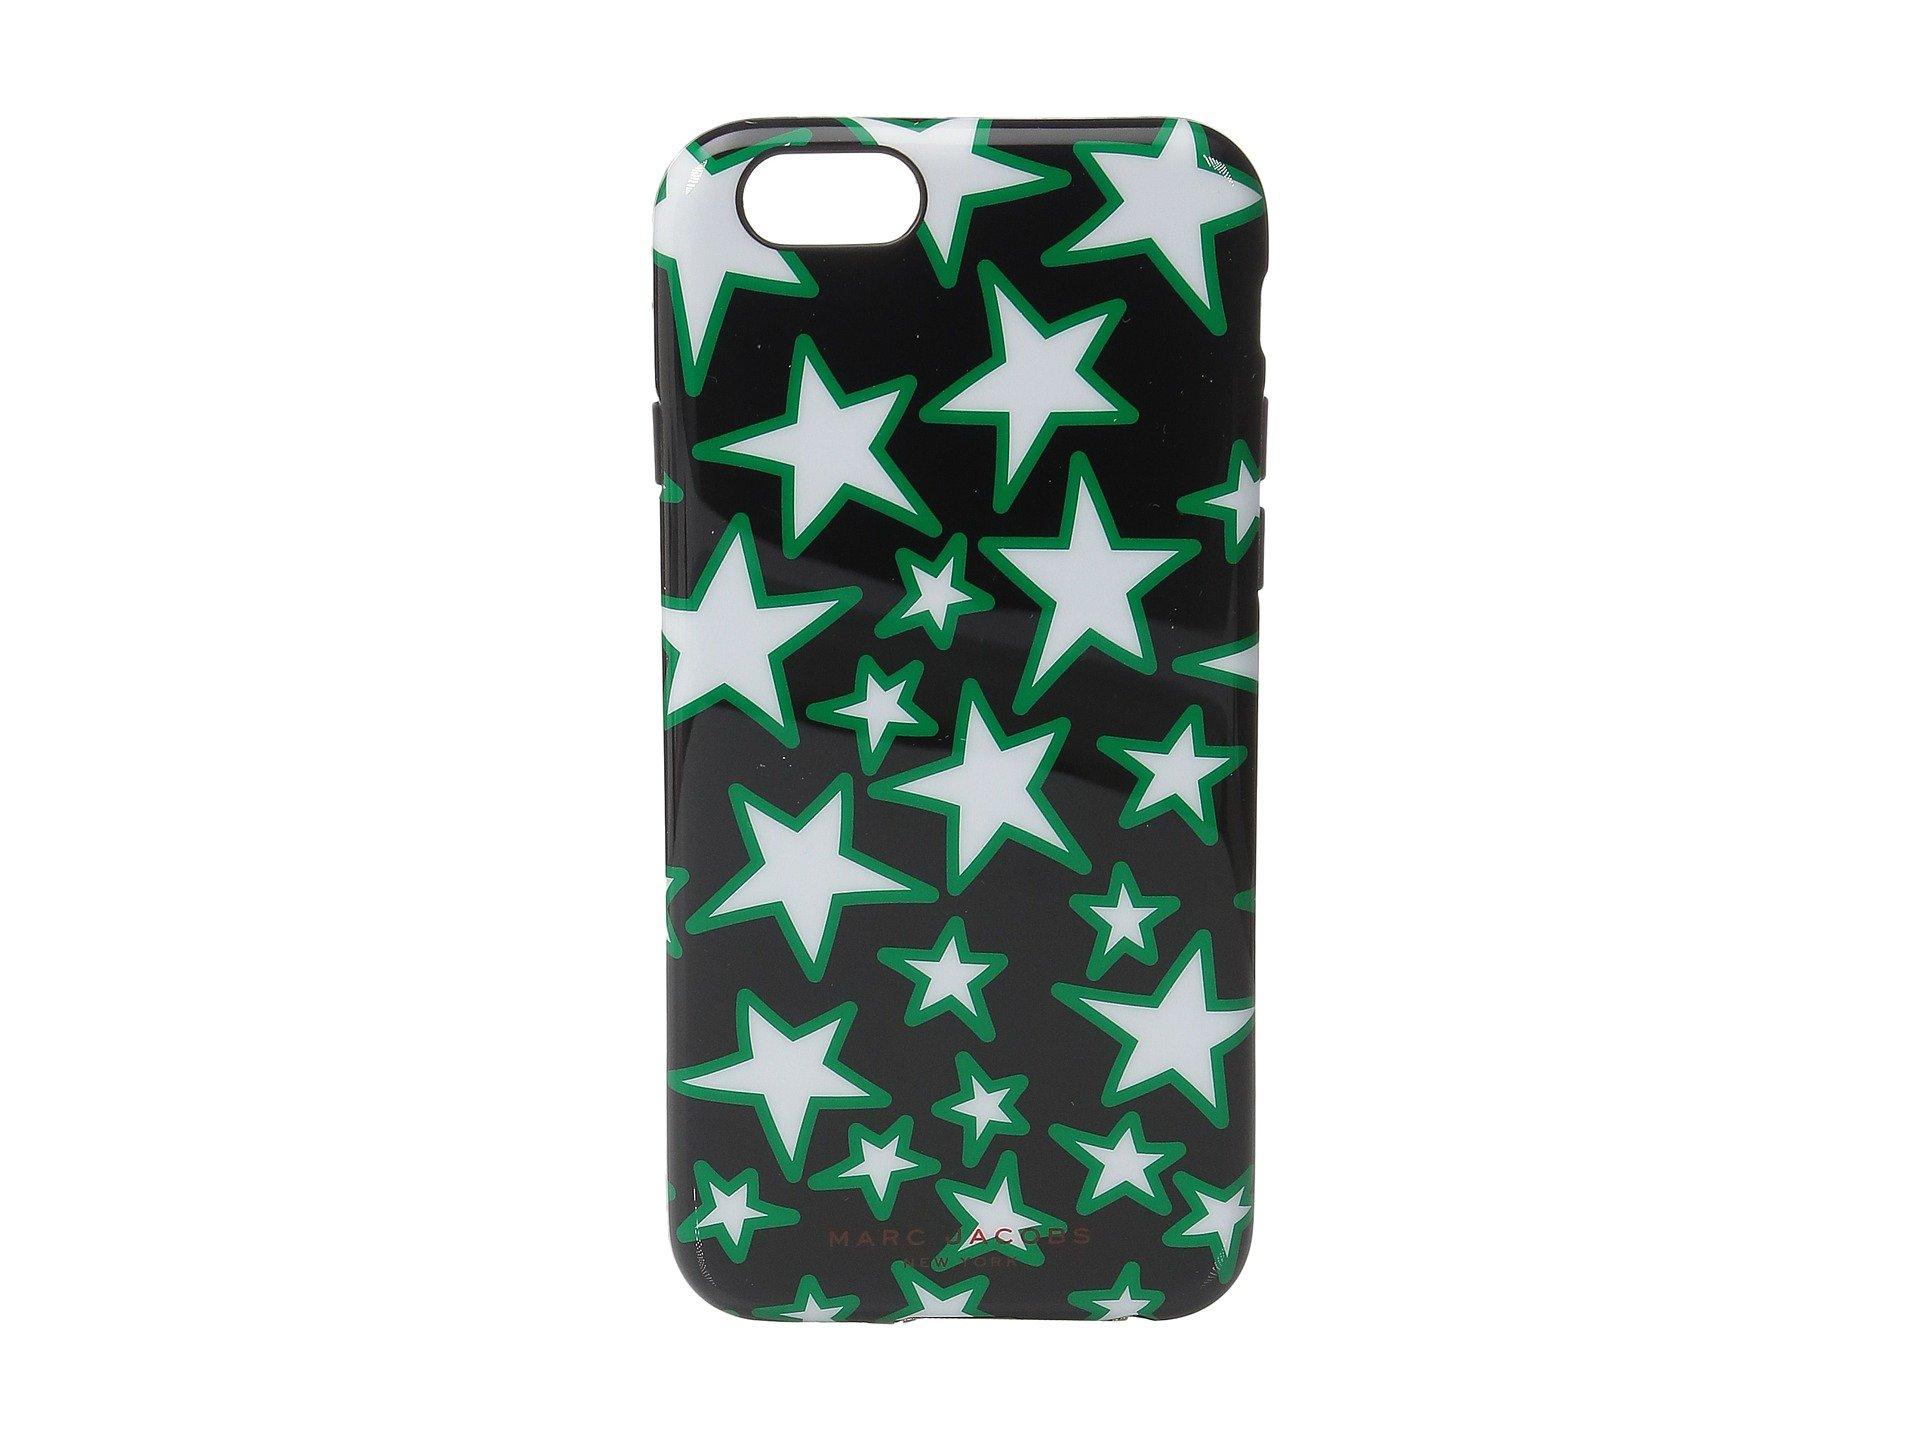 Accesorio para el Celular Marc Jacobs Stars iPhone 6S Case  + Marc Jacobs en VeoyCompro.net